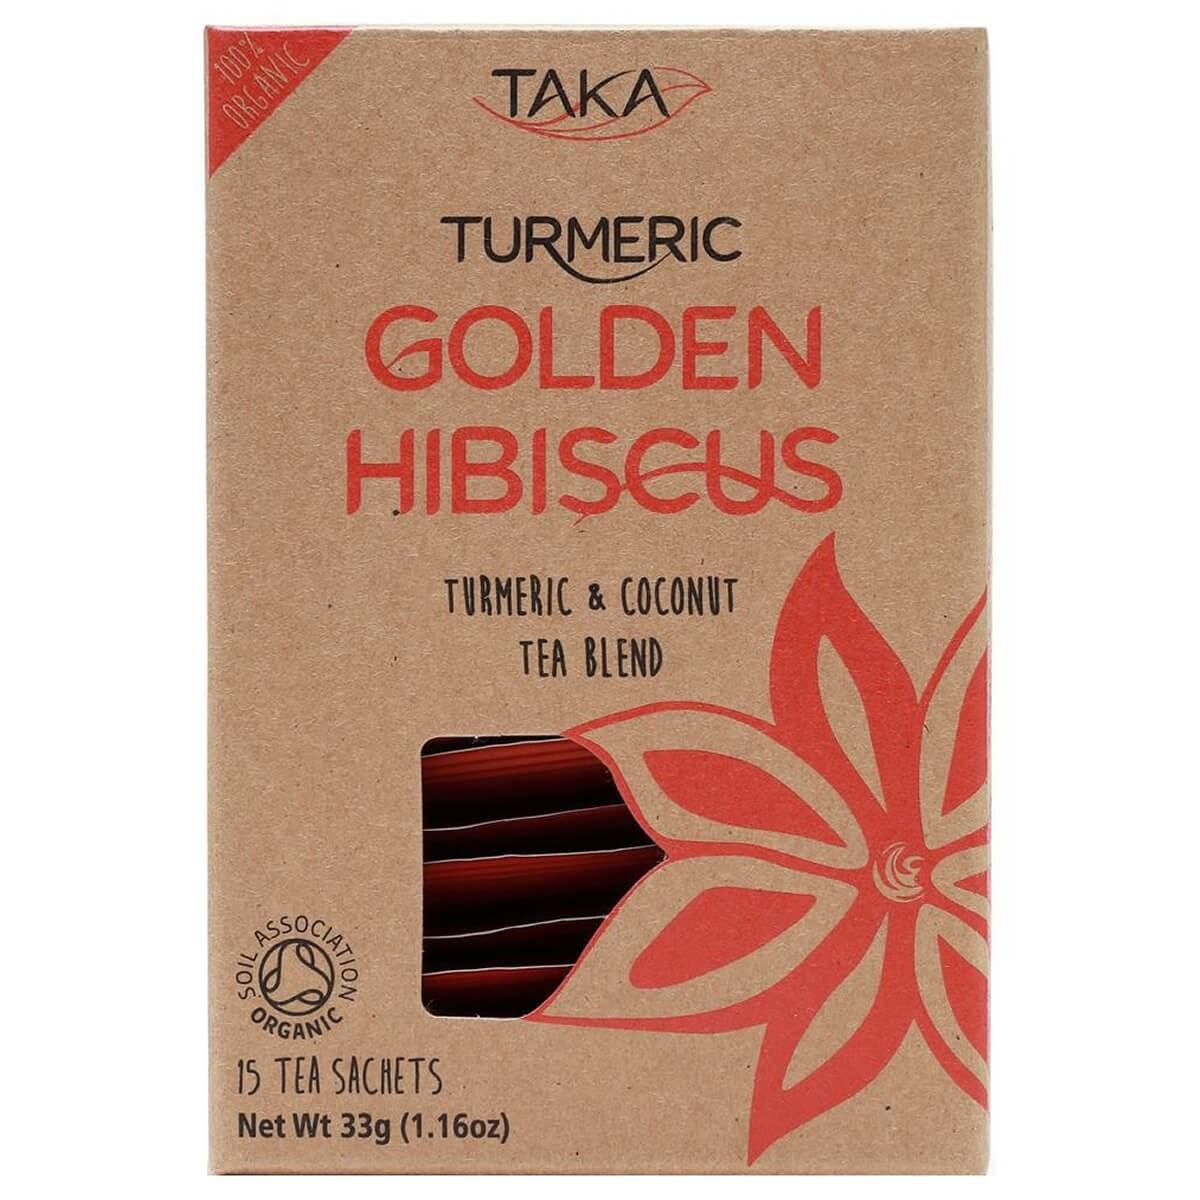 Taka Turmeric Golden Hibiscus Turmeric & Coconut Tea Blend